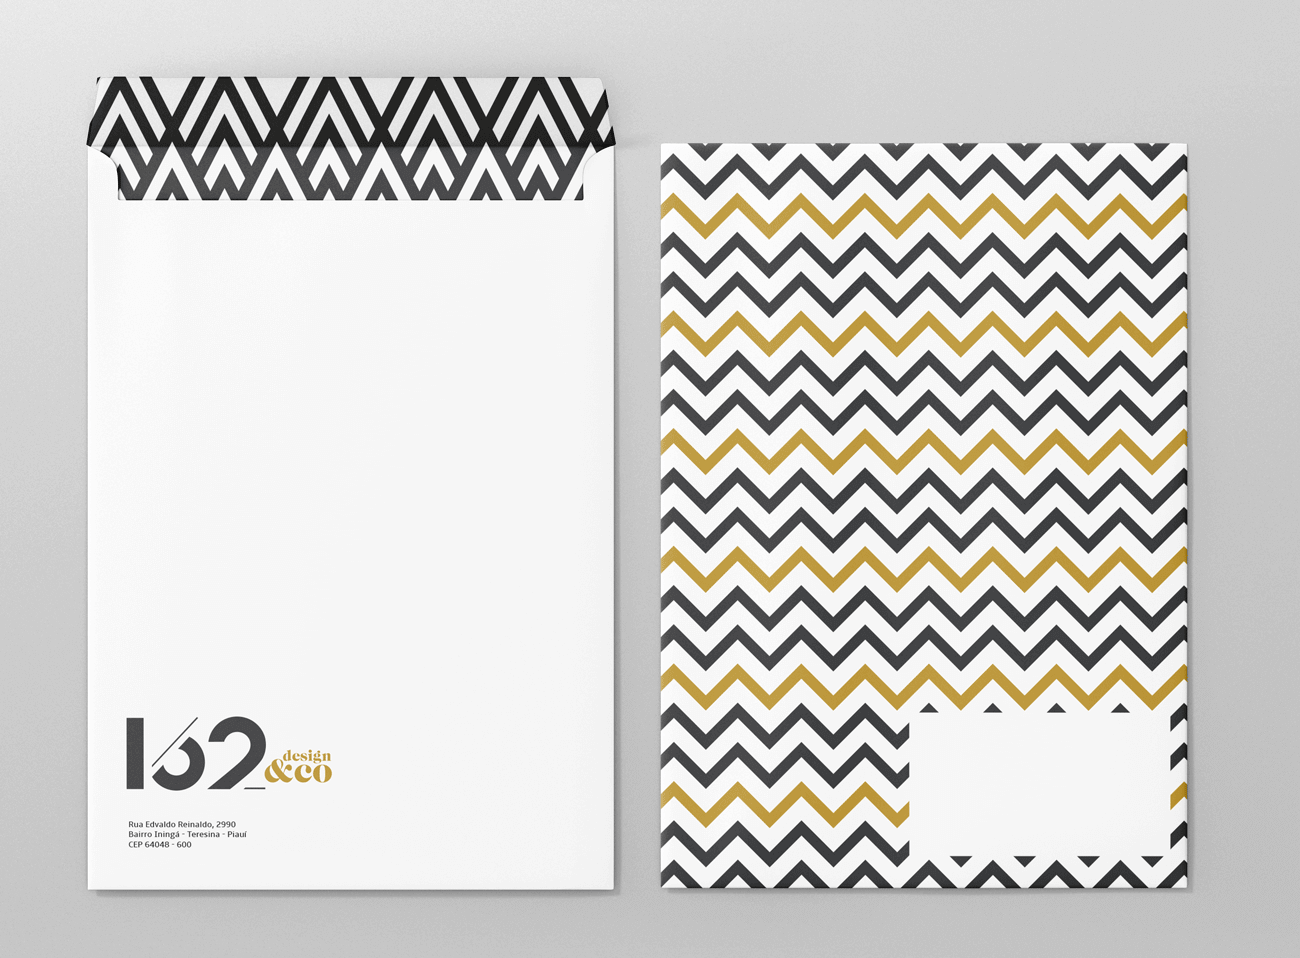 162 design envelope saco